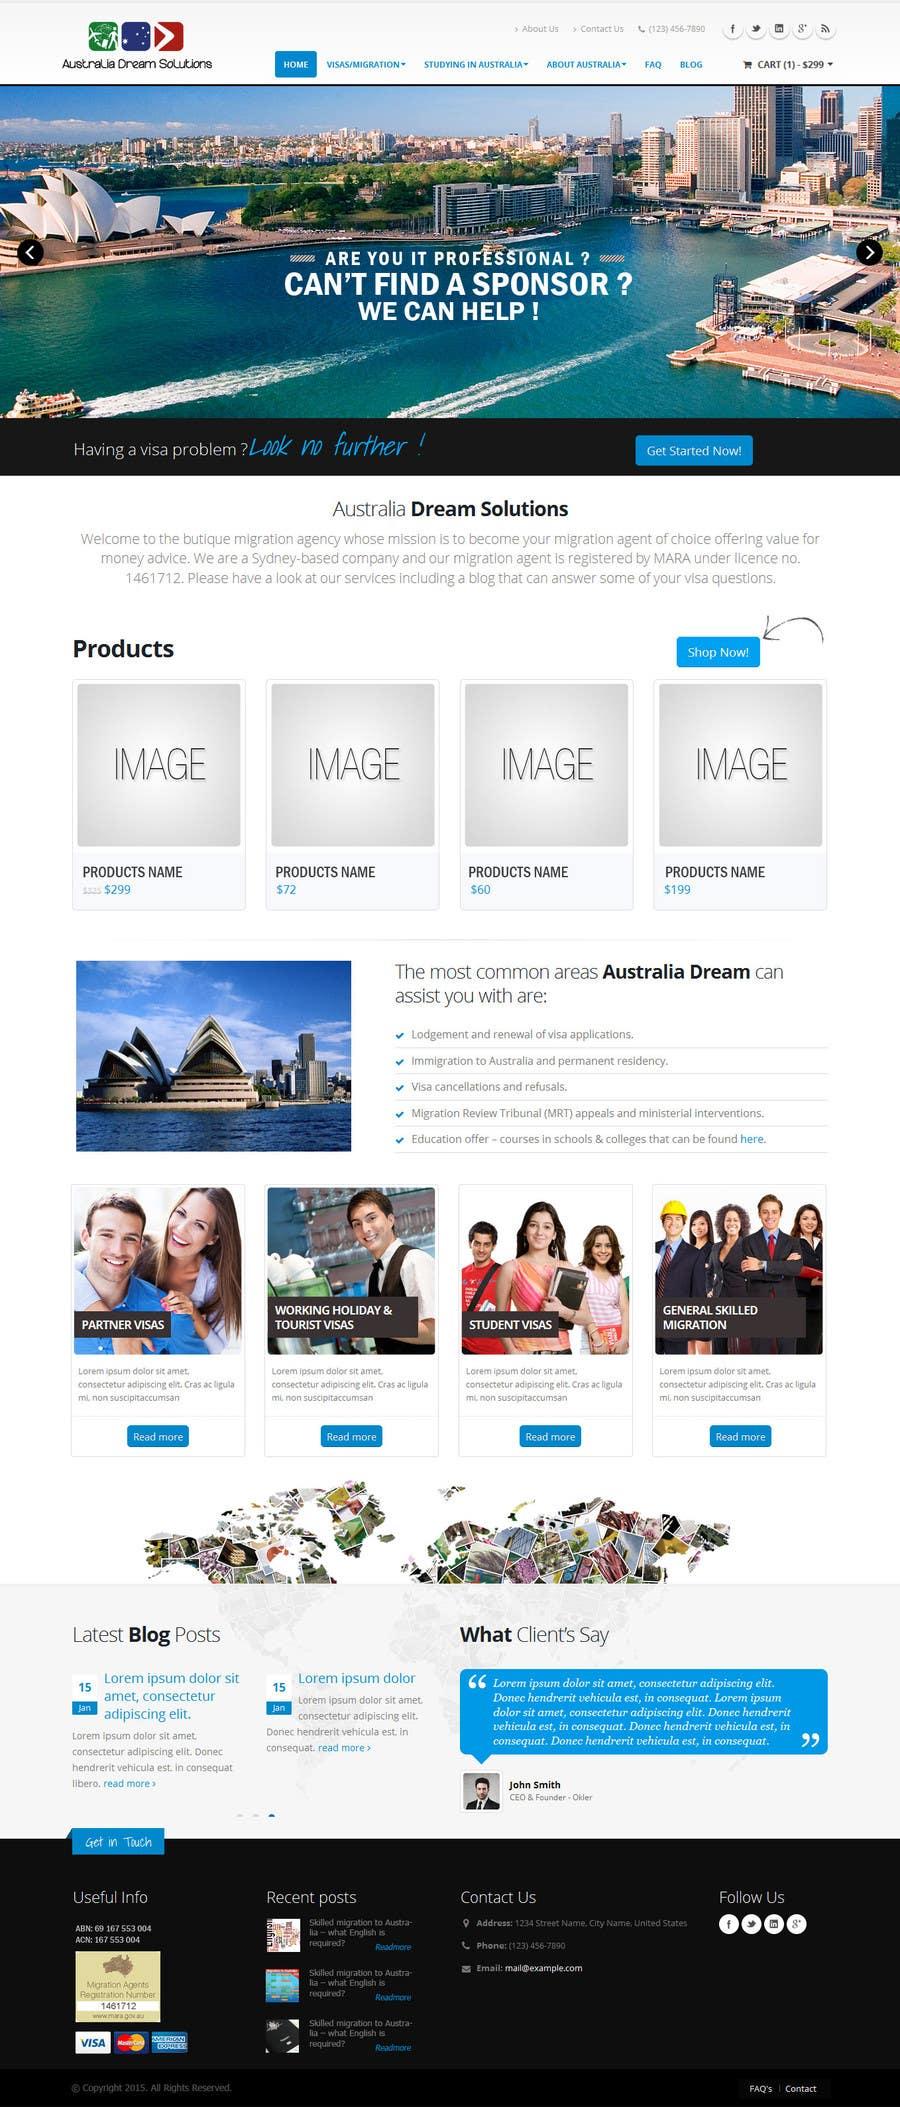 Kilpailutyö #6 kilpailussa Home page redesign by making it sales-focused (legal services).